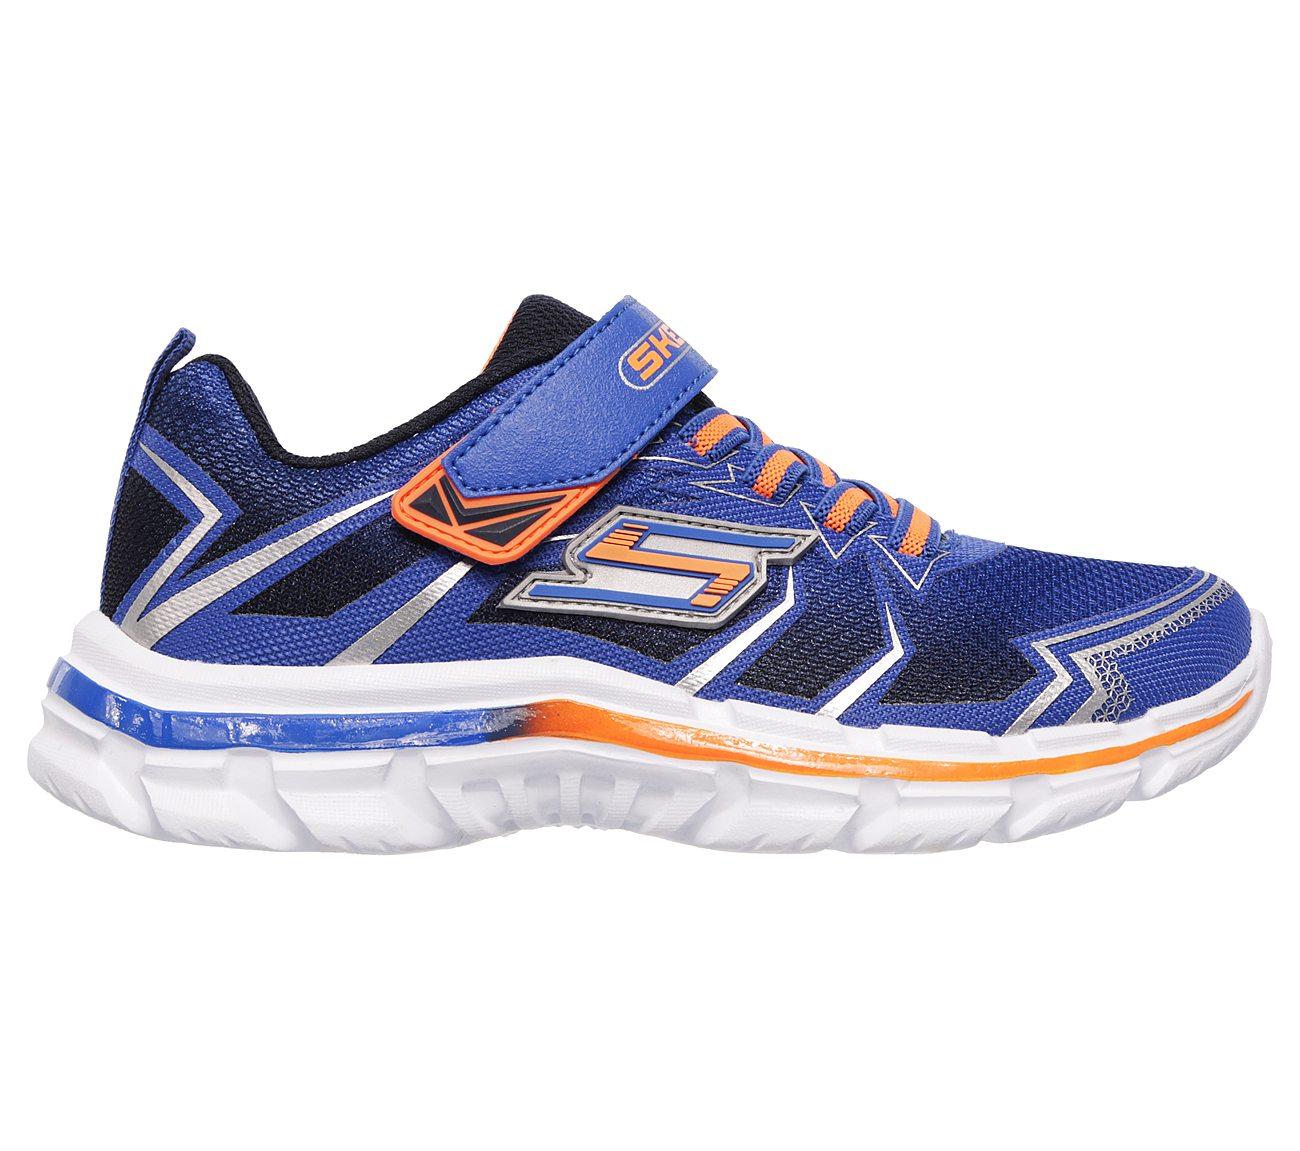 Quick Blast SKECHERS Sport Shoes